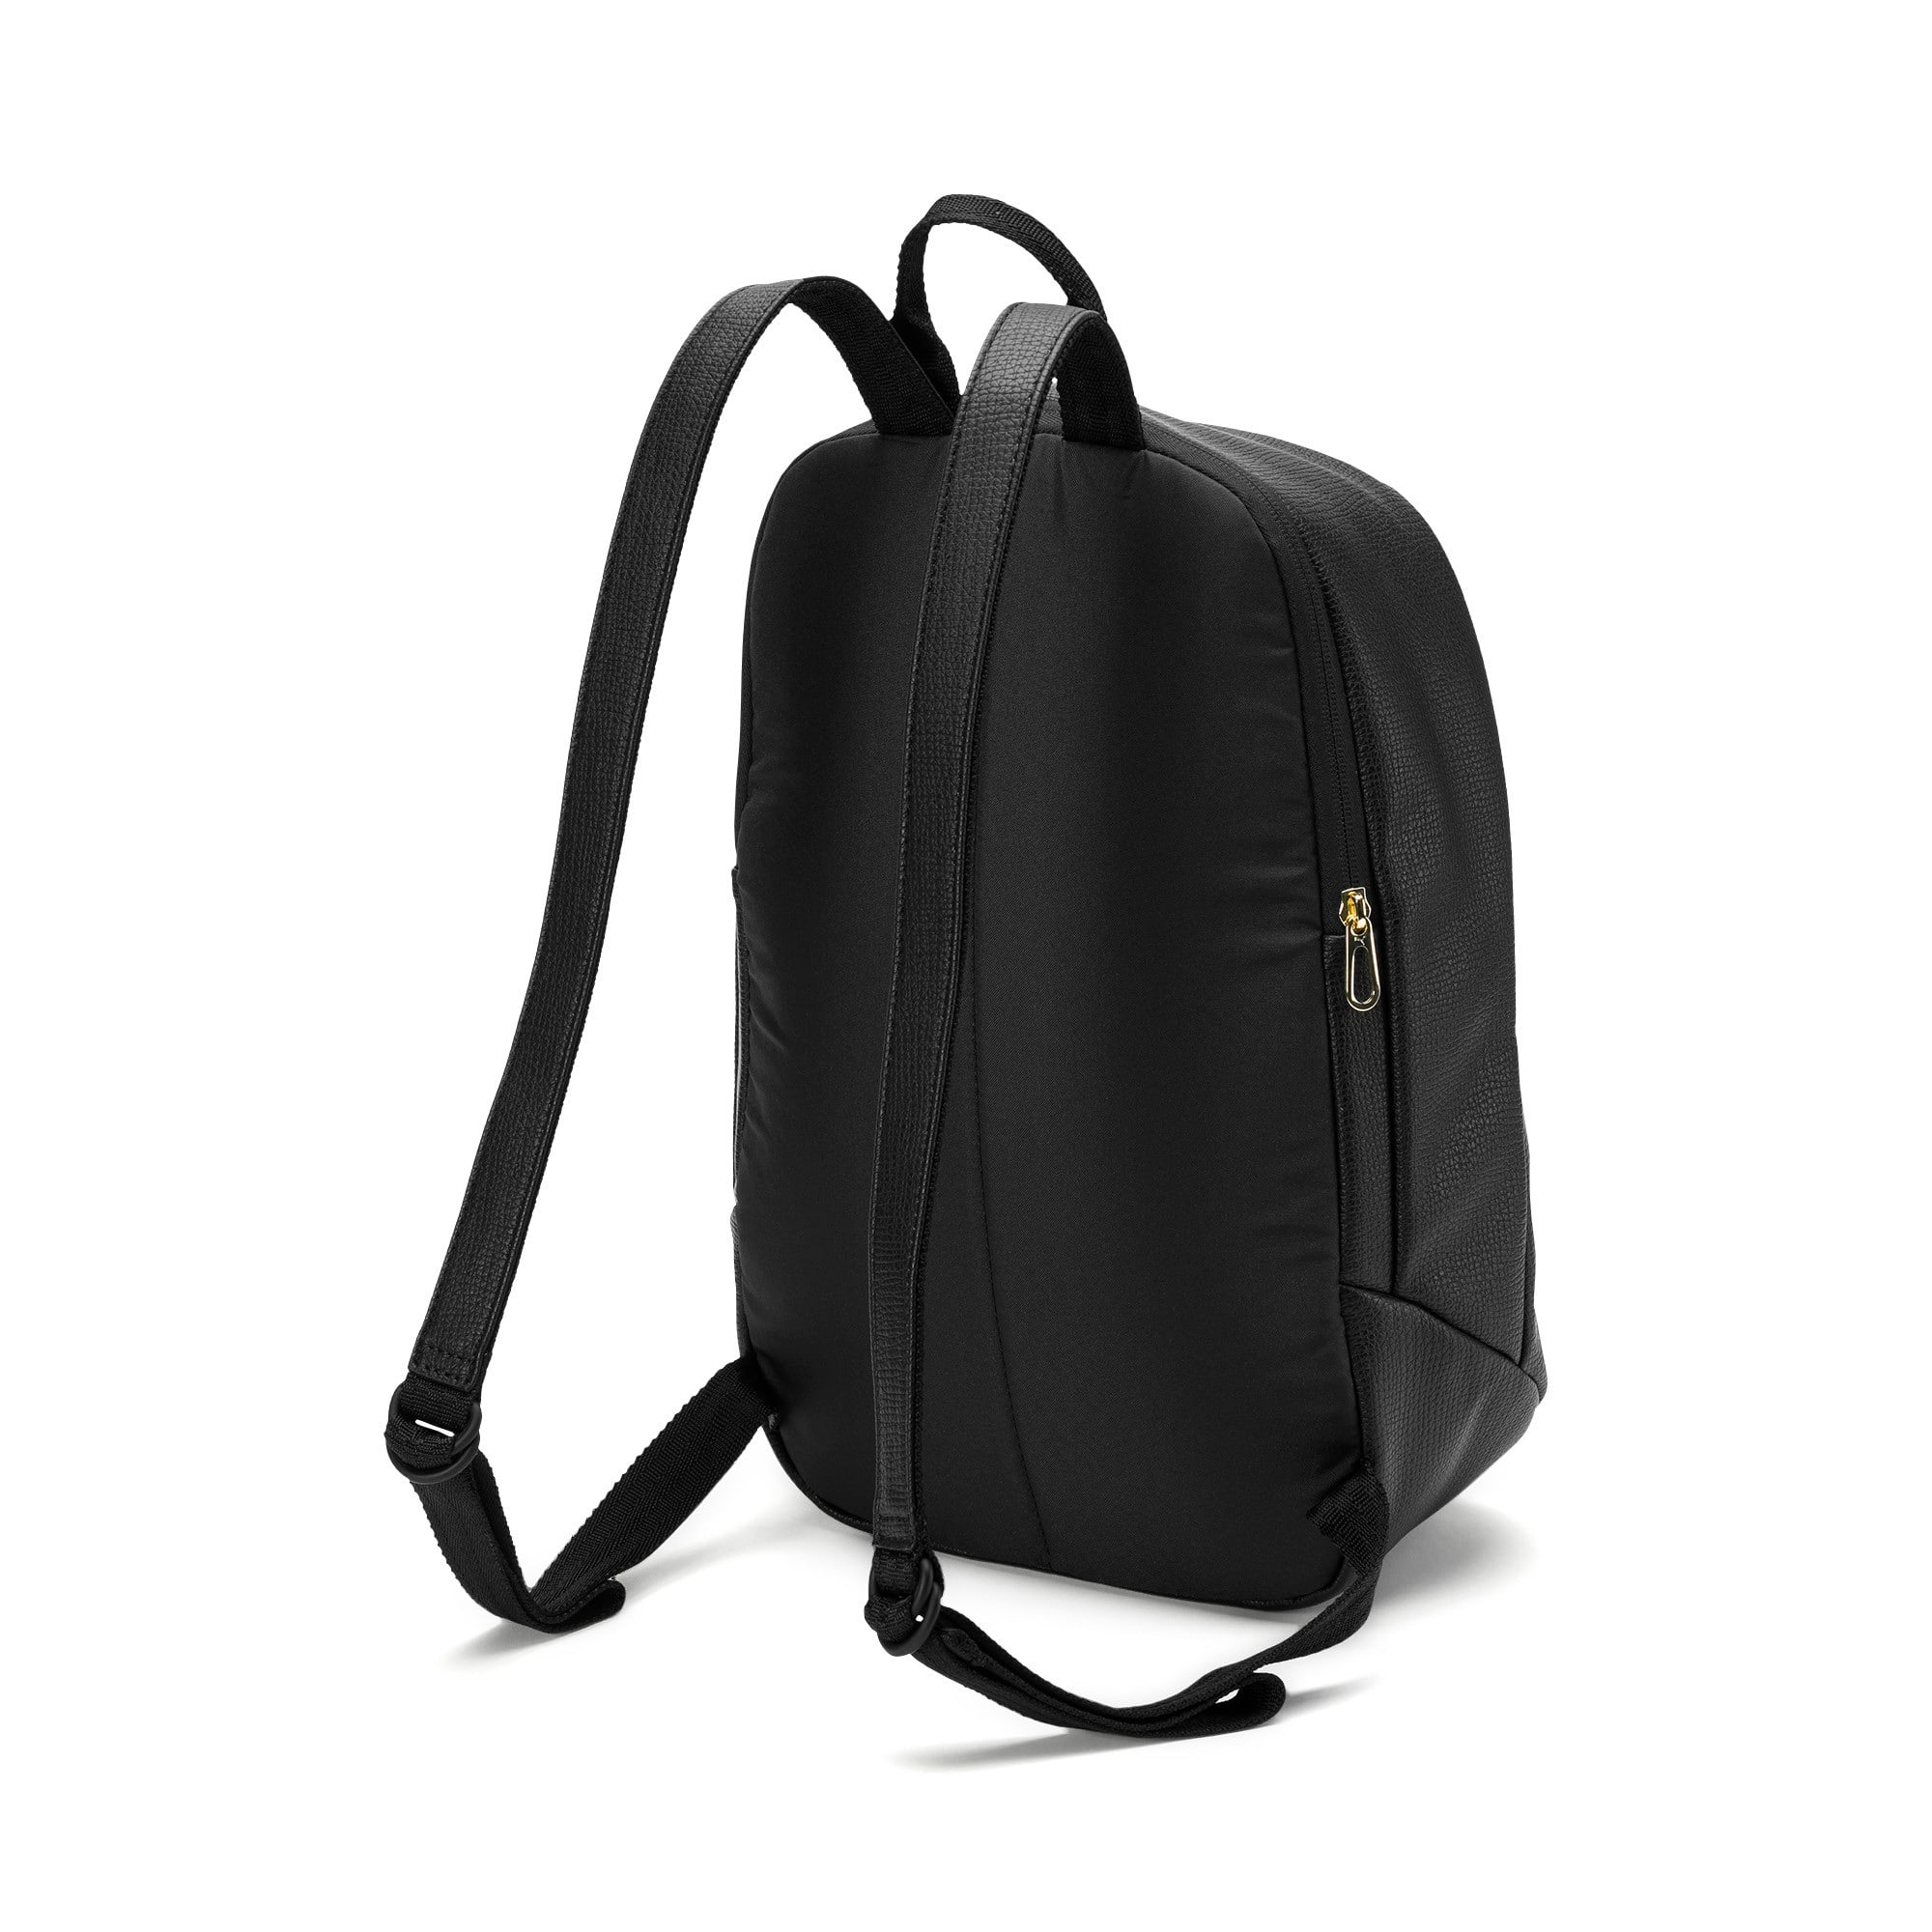 Thumbnail 3 of Ferrari Lifestyle Zainetto Backpack, Puma Black, medium